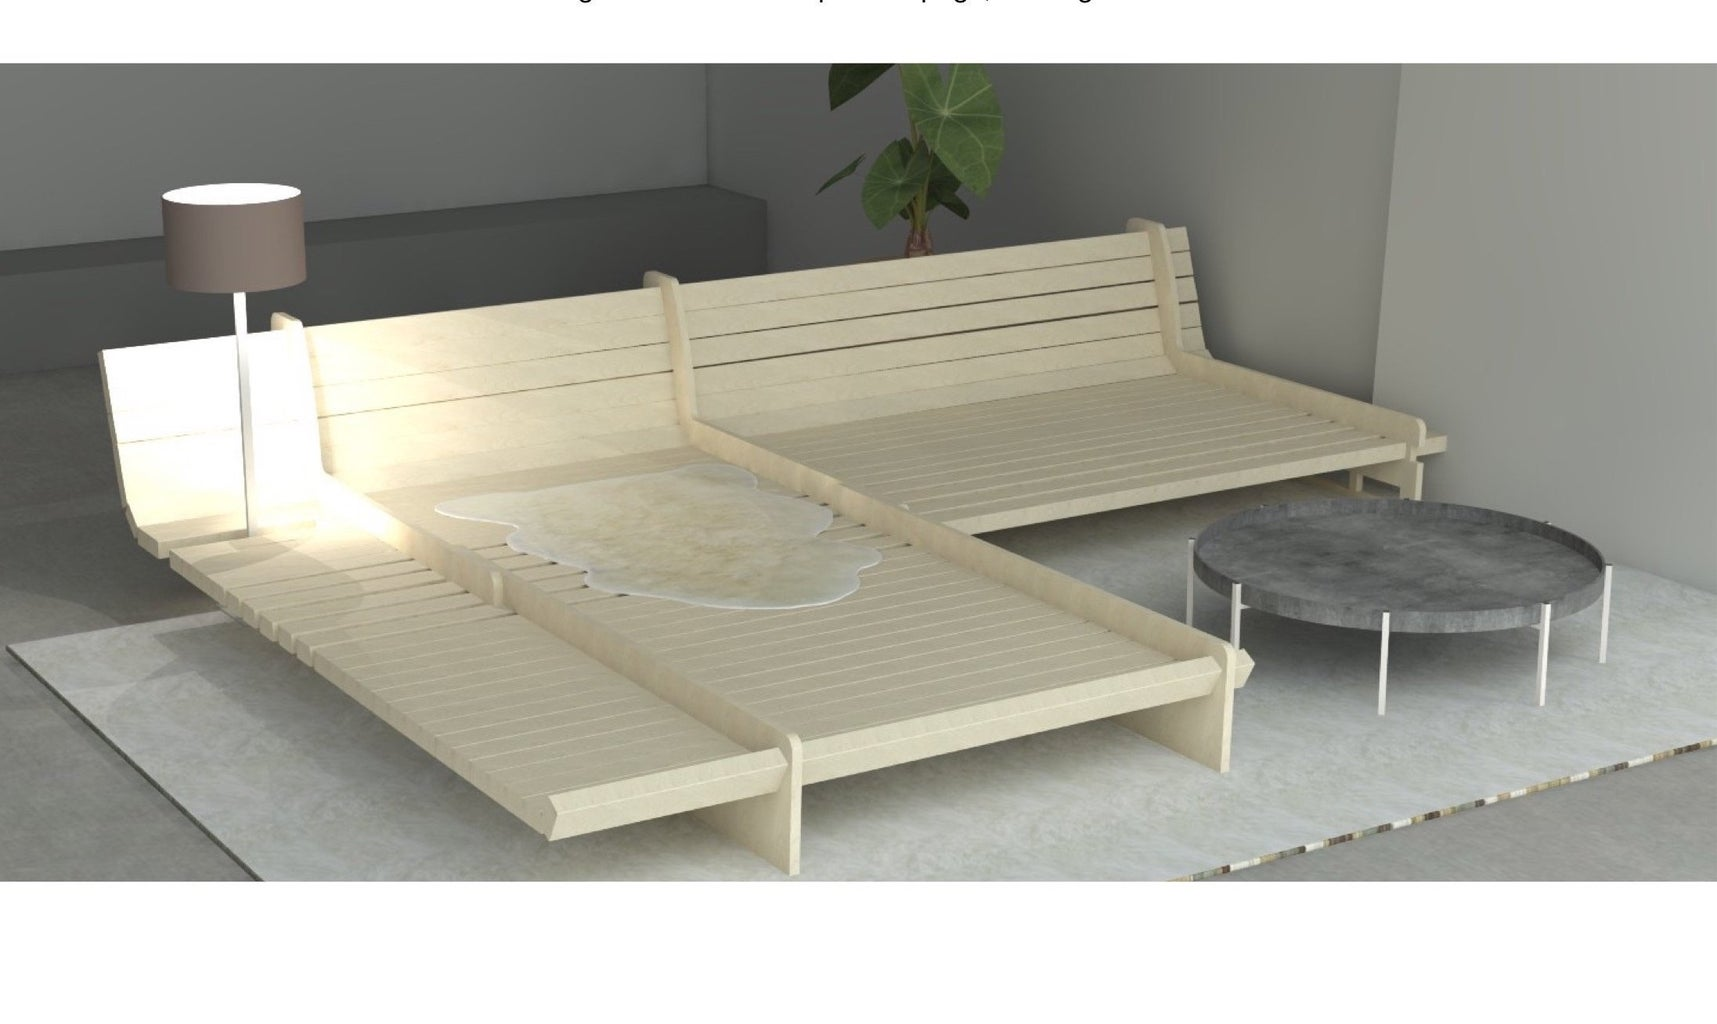 Enjoy Your New DIY Sofa Bed Frame!